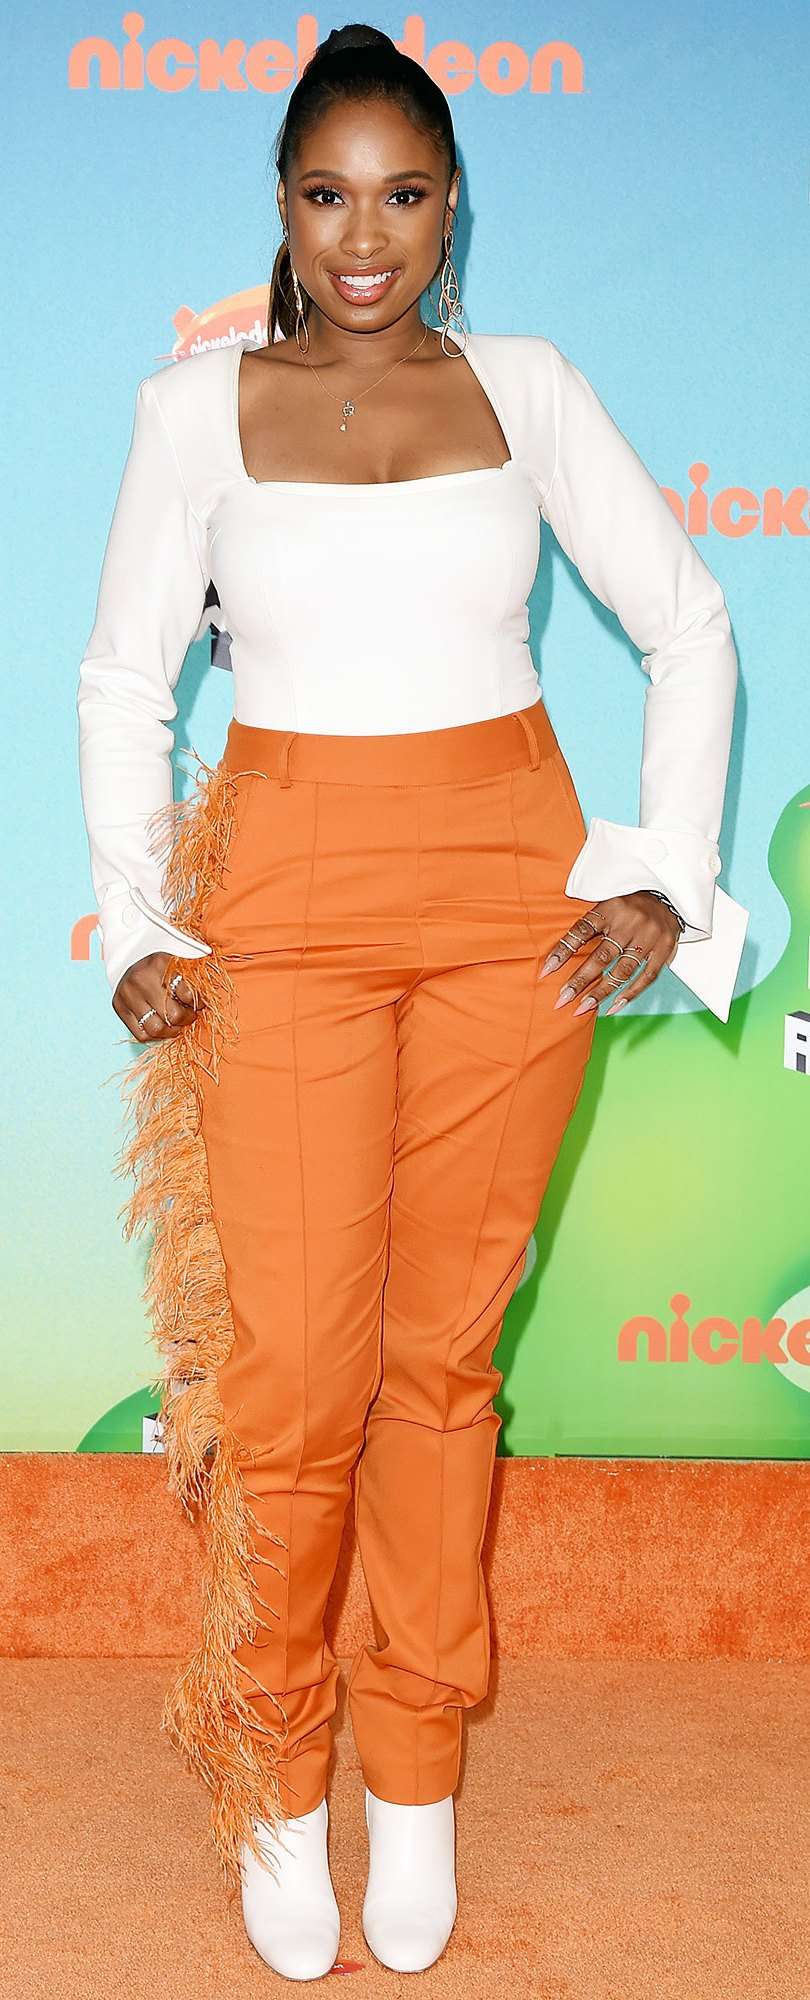 Nickelodeon Kids Choice Awards 2019 Jennifer Hudson